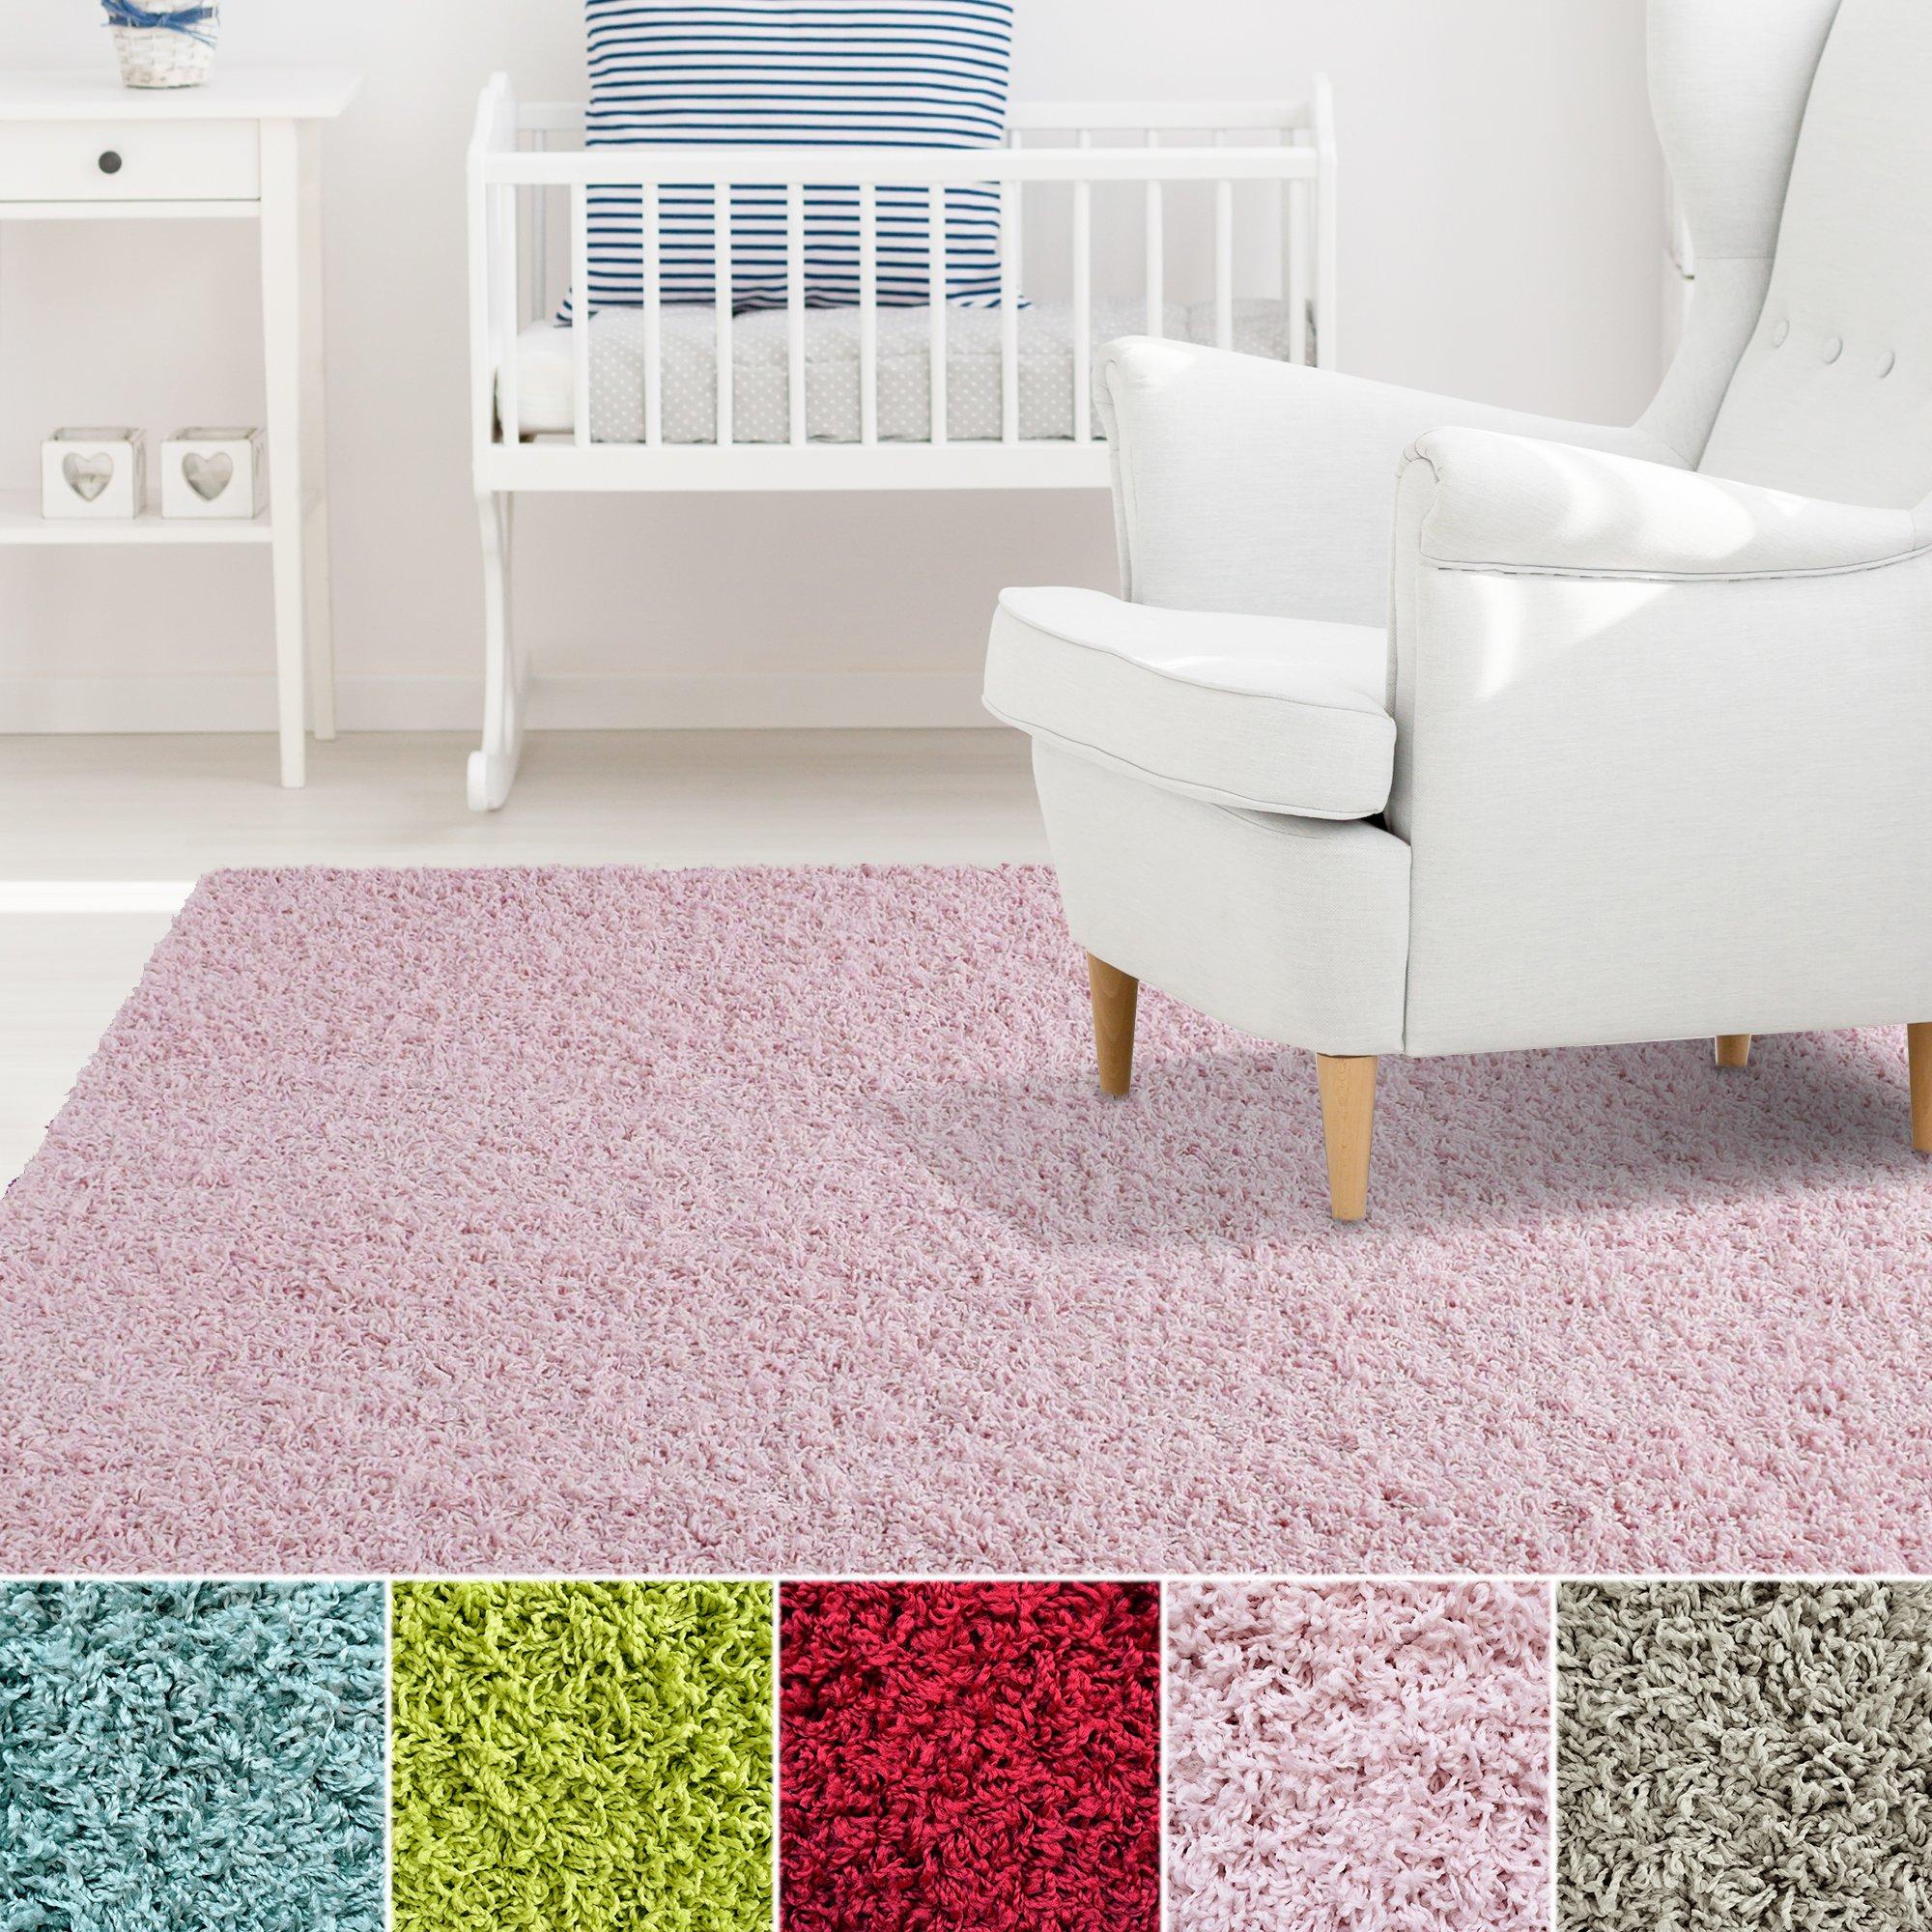 iCustomRug Affordable Shaggy Rug Dixie Cozy & Soft Kids Shag Area Rug Solid Color Pink, For Children's Play Area, Bedroom or Nursery Carpet 9 Feet x 11 Feet (9'x11')